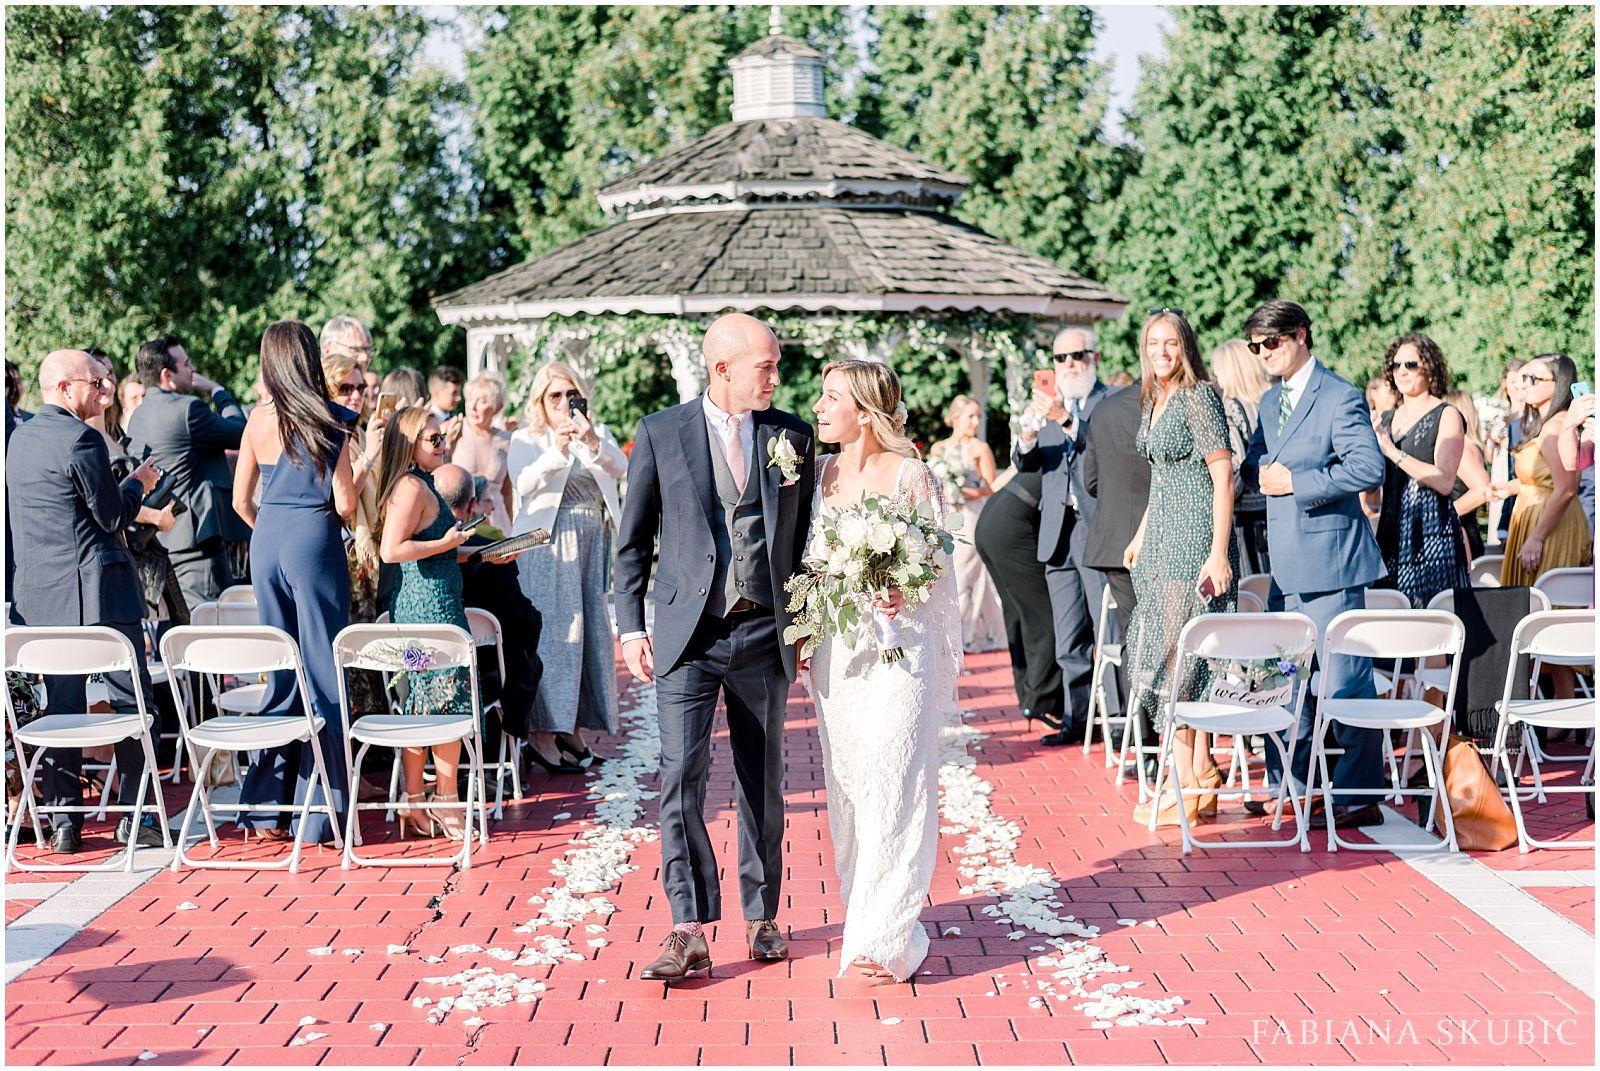 FabianaSkubic_H&M_Wedding_0050.jpg